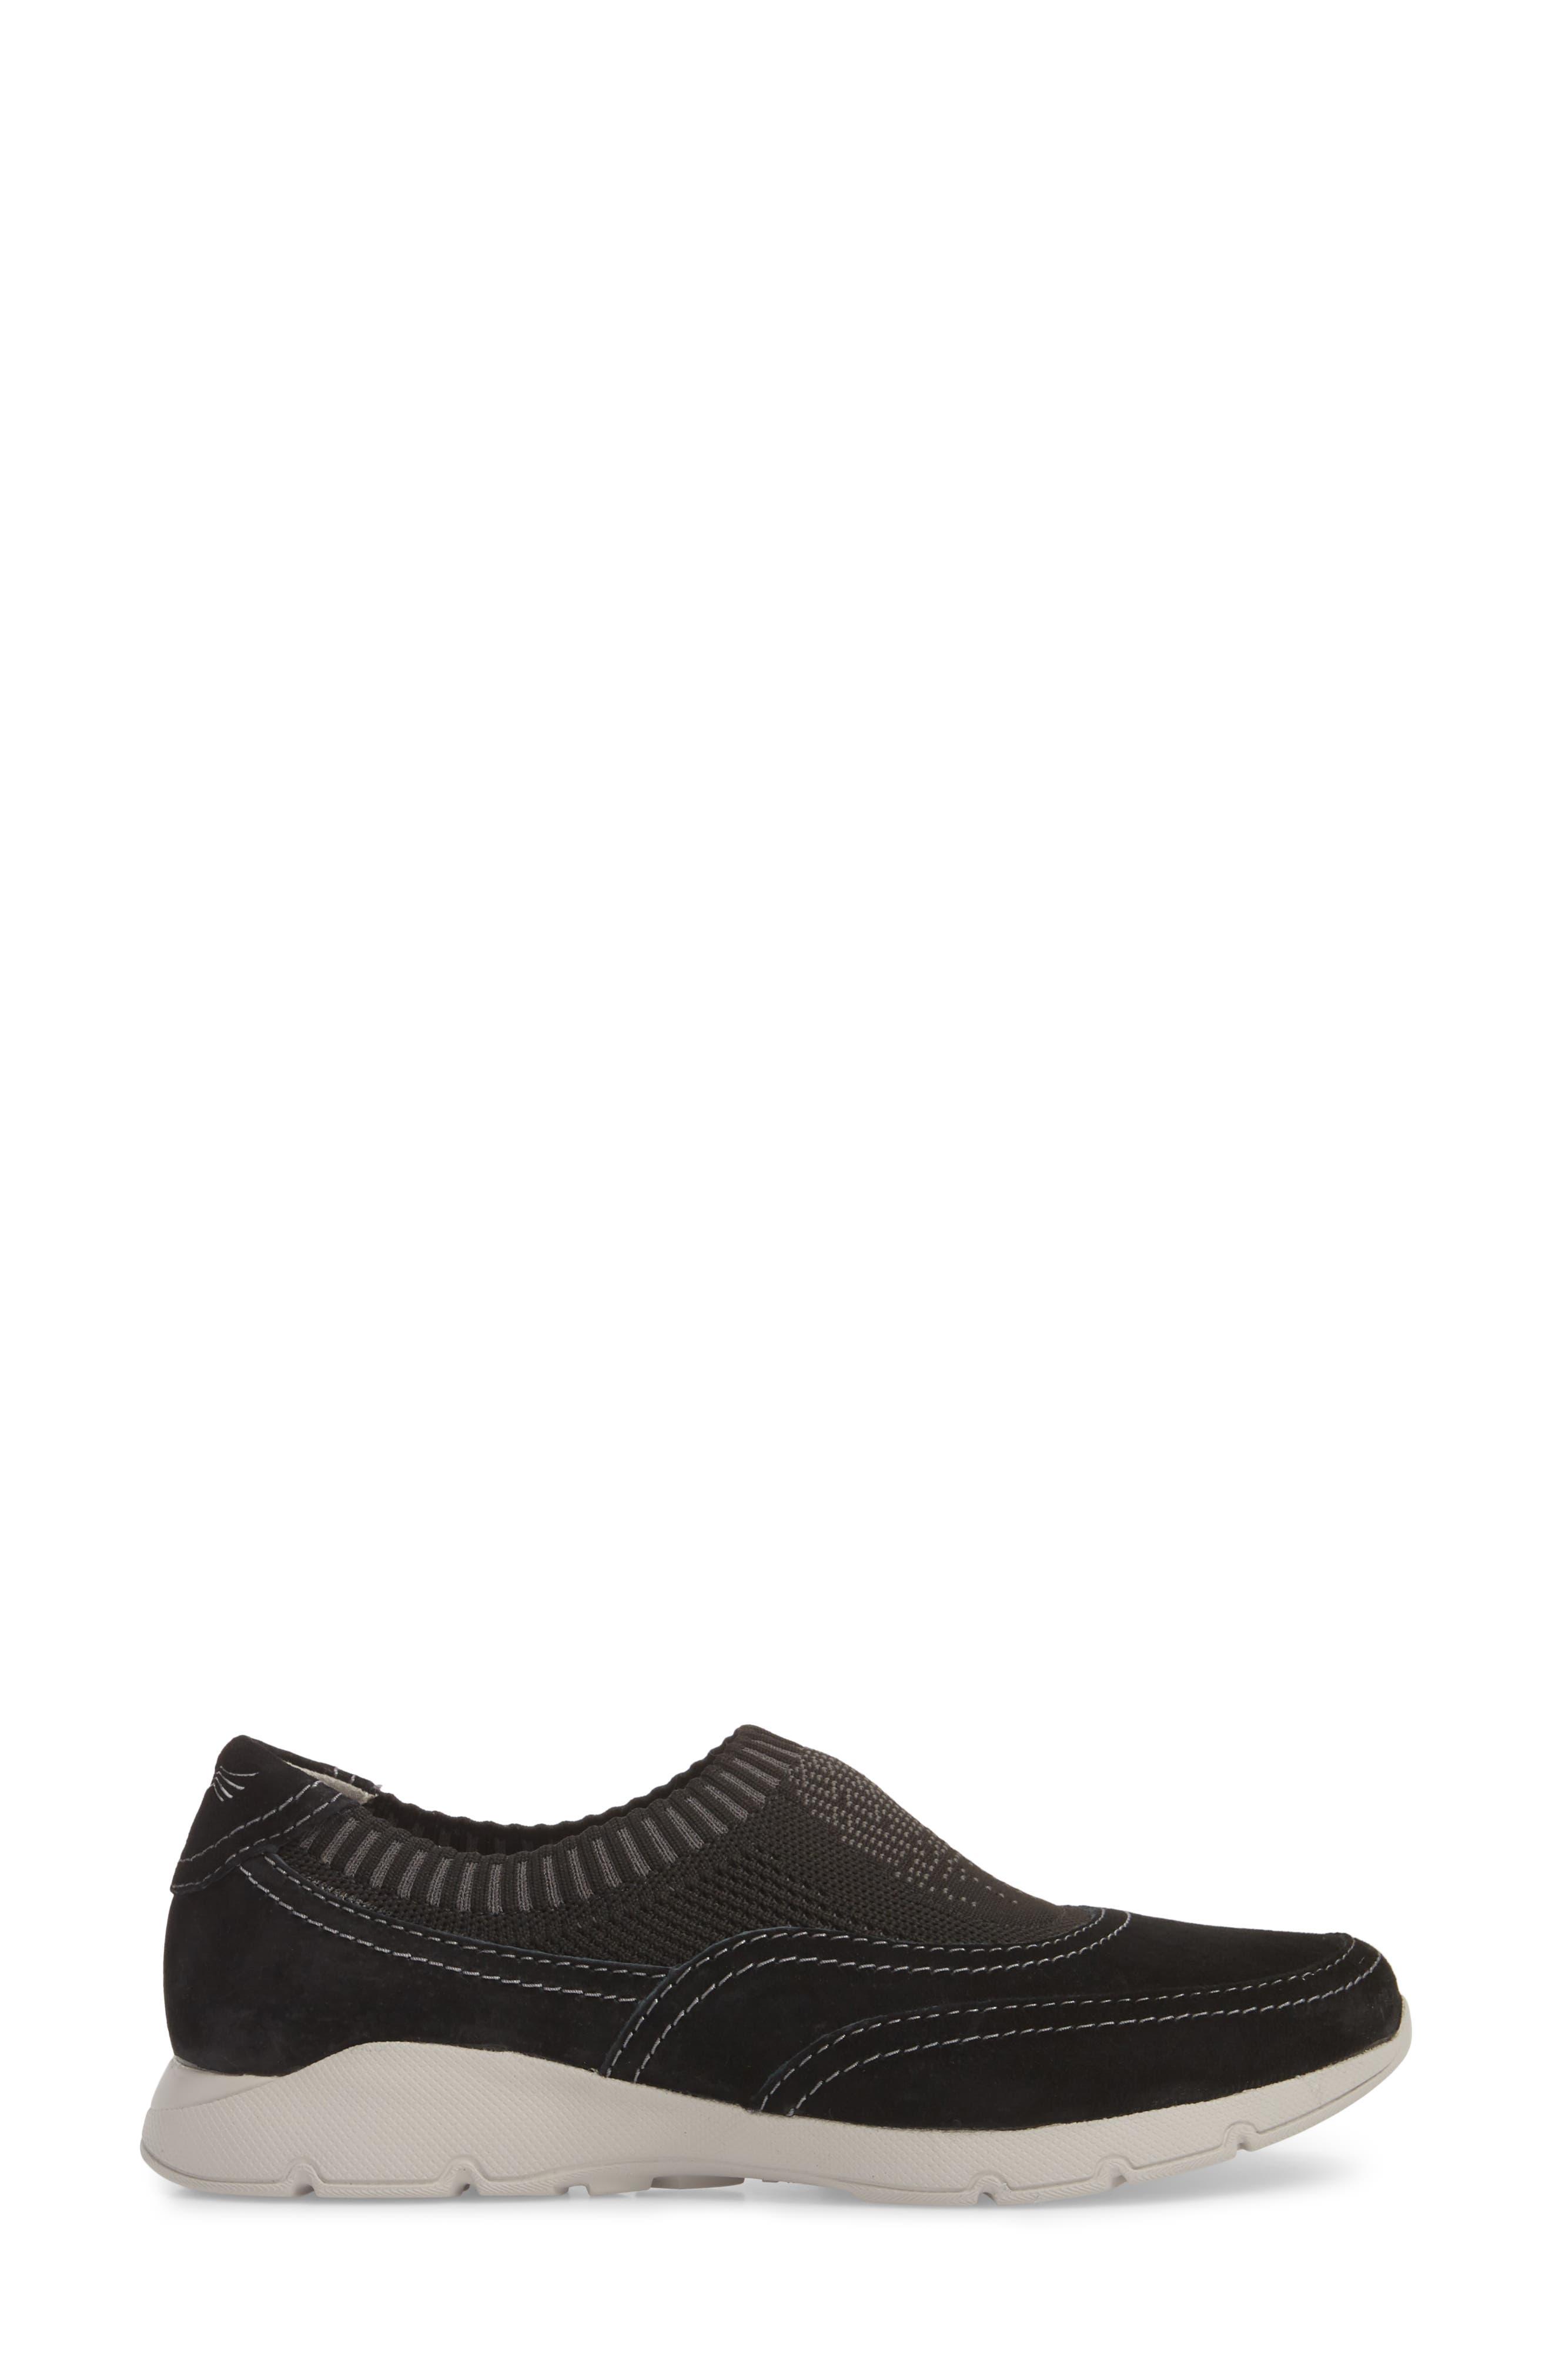 Alice Slip-On Sneaker,                             Alternate thumbnail 6, color,                             Black Suede